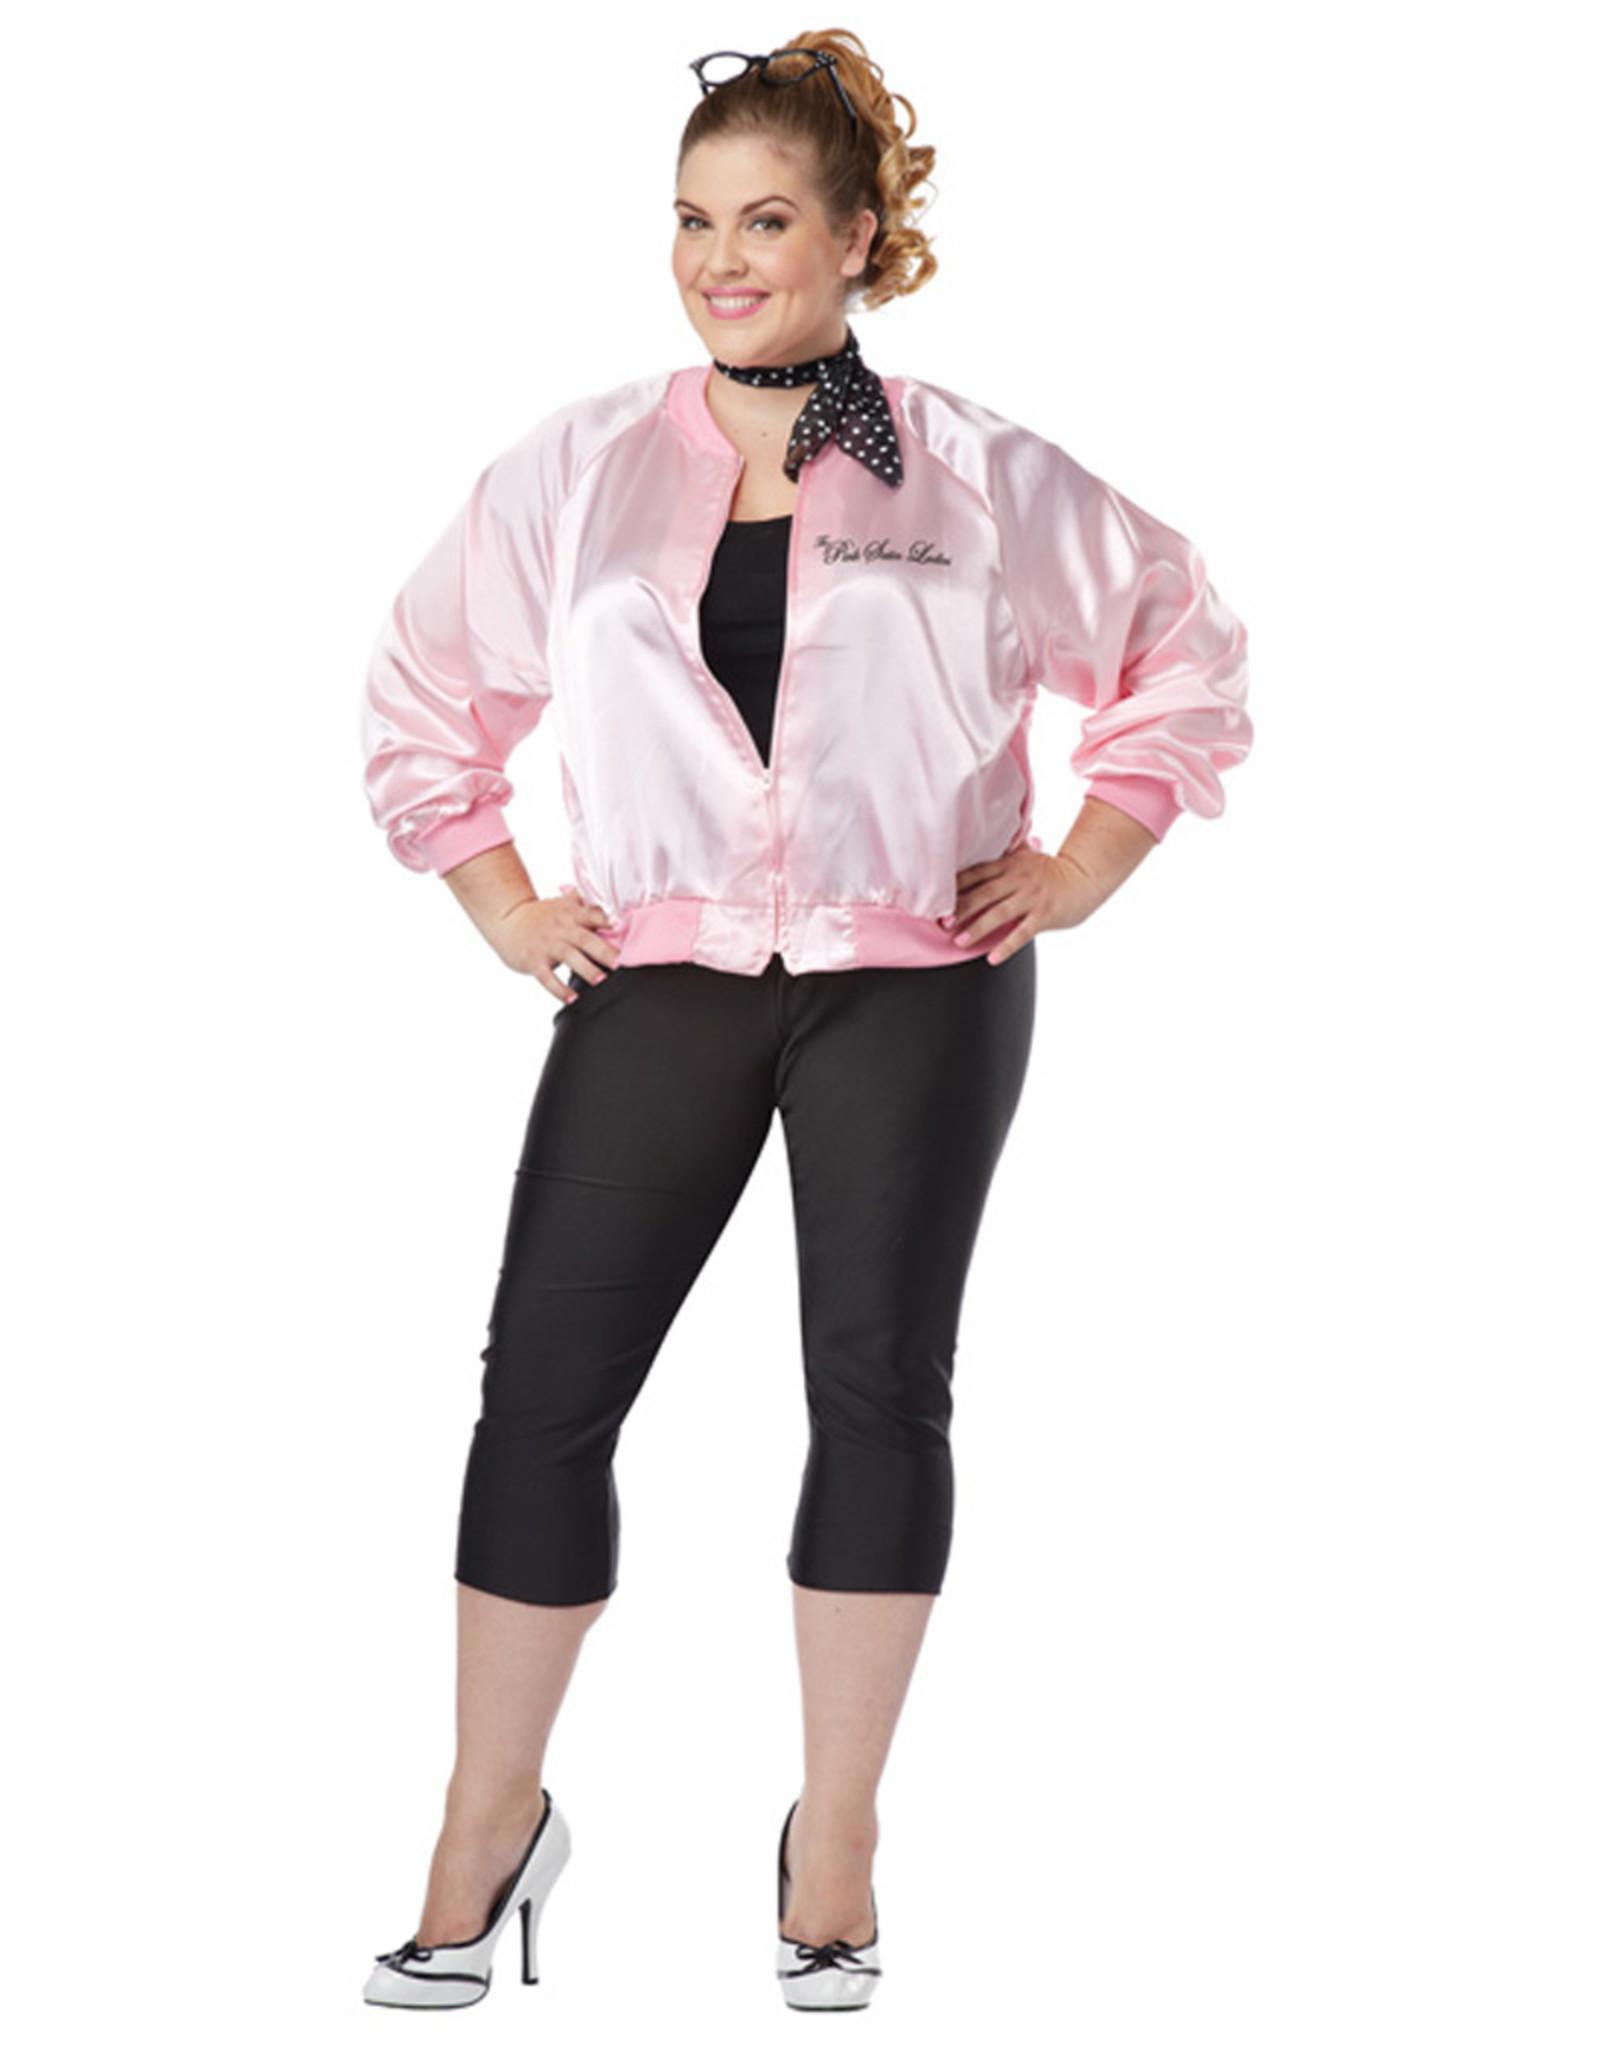 The Pink Satin  Ladies Jacket Costume - Women Plus